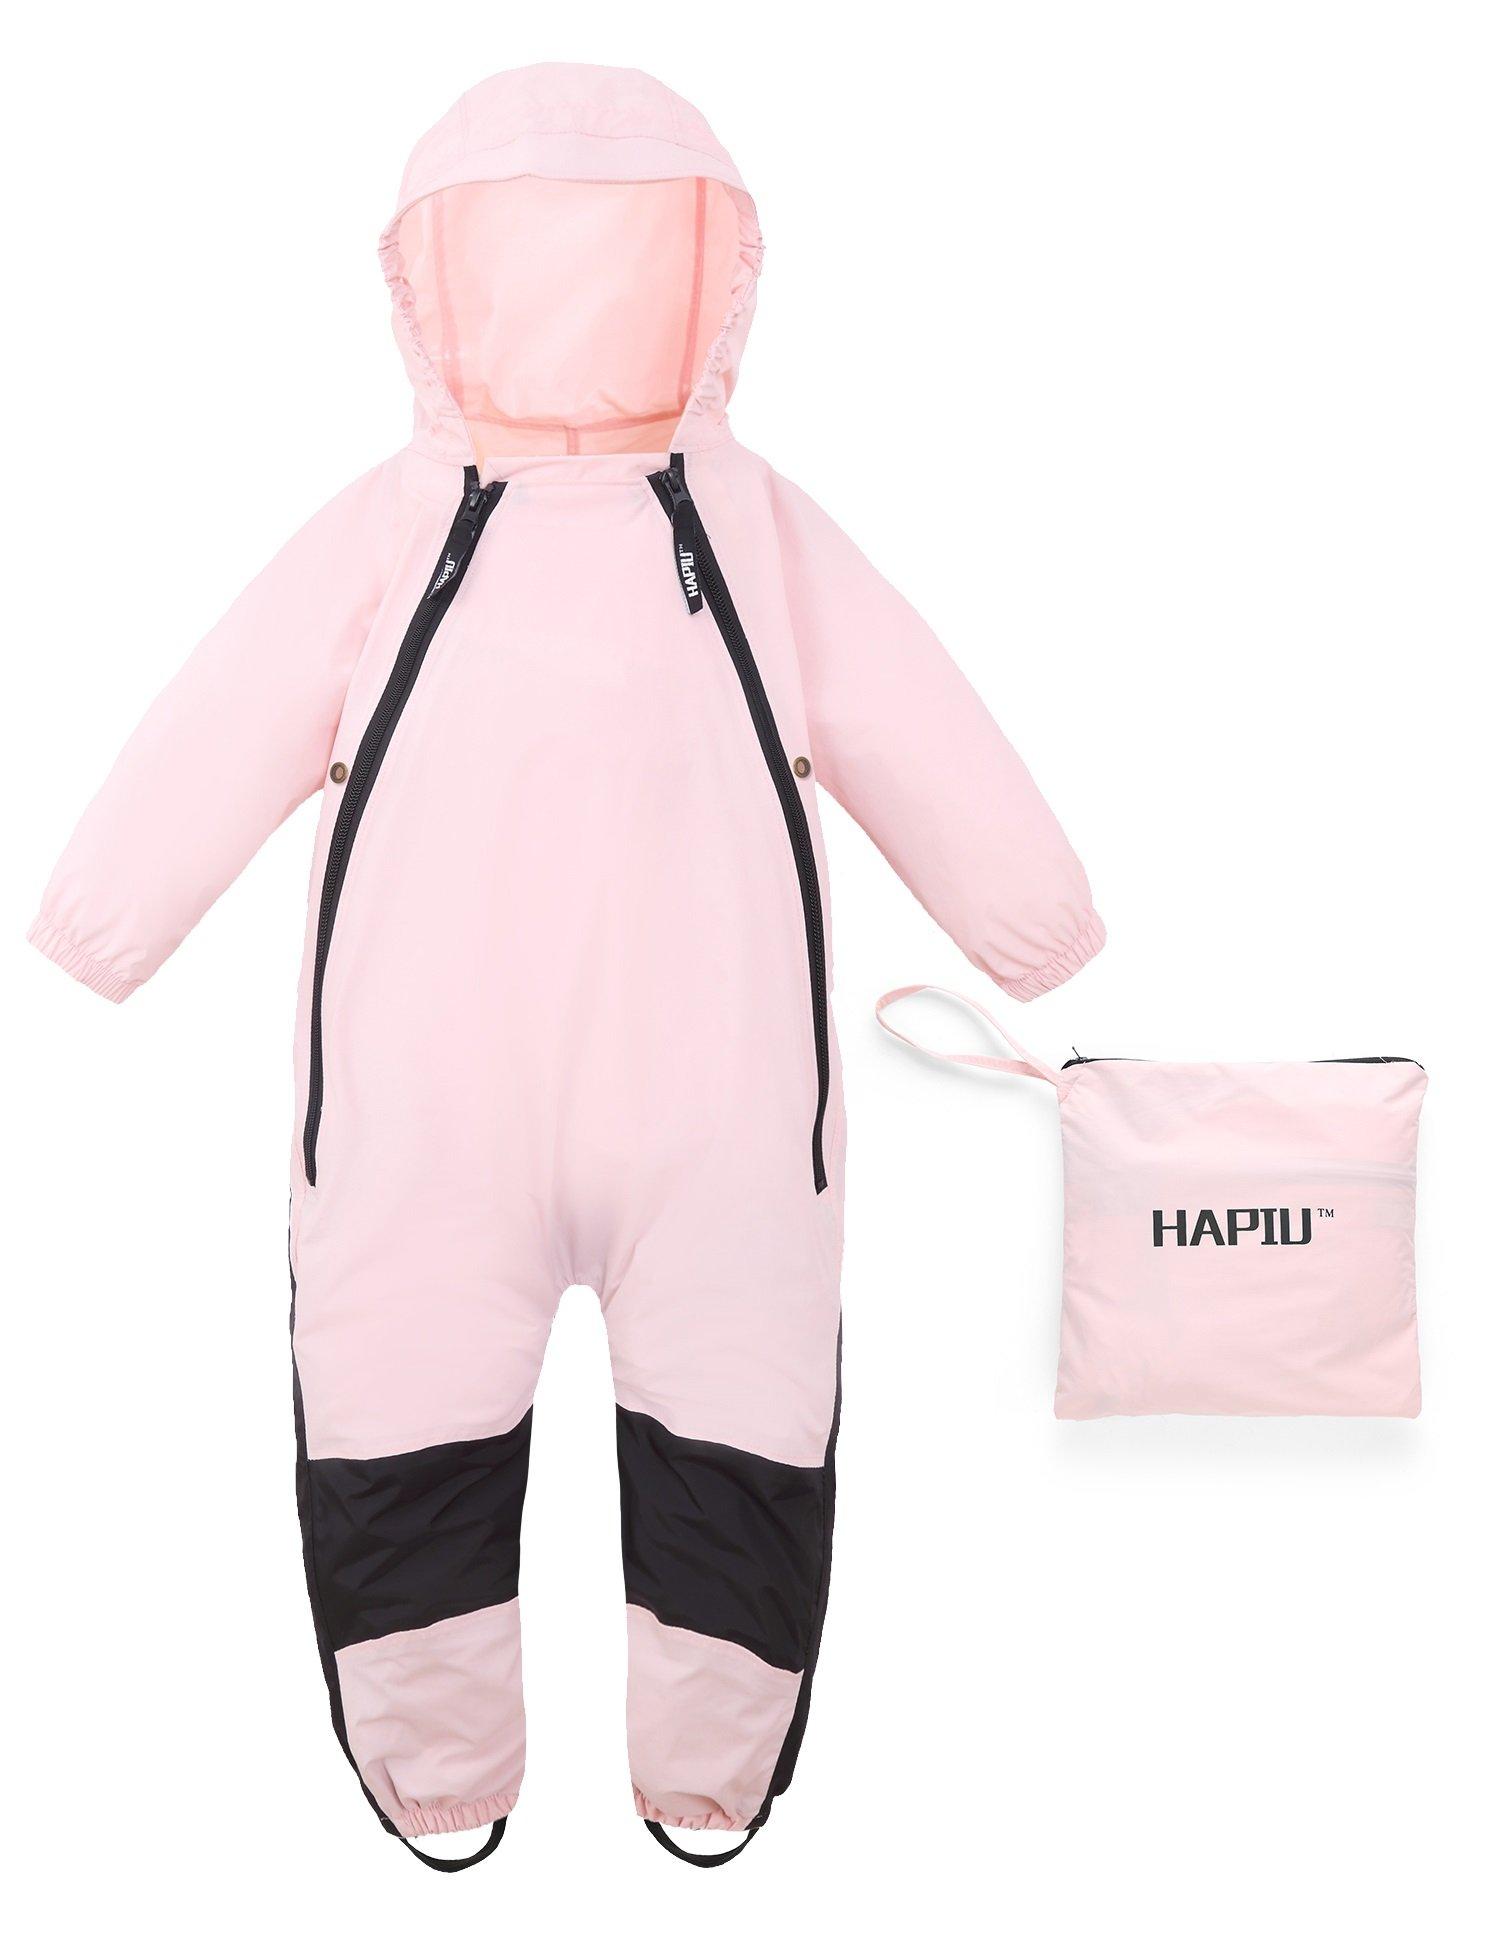 HAPIU Kids Toddler Rain Suit Muddy Buddy Waterproof Coverall,Pink,12M,Original